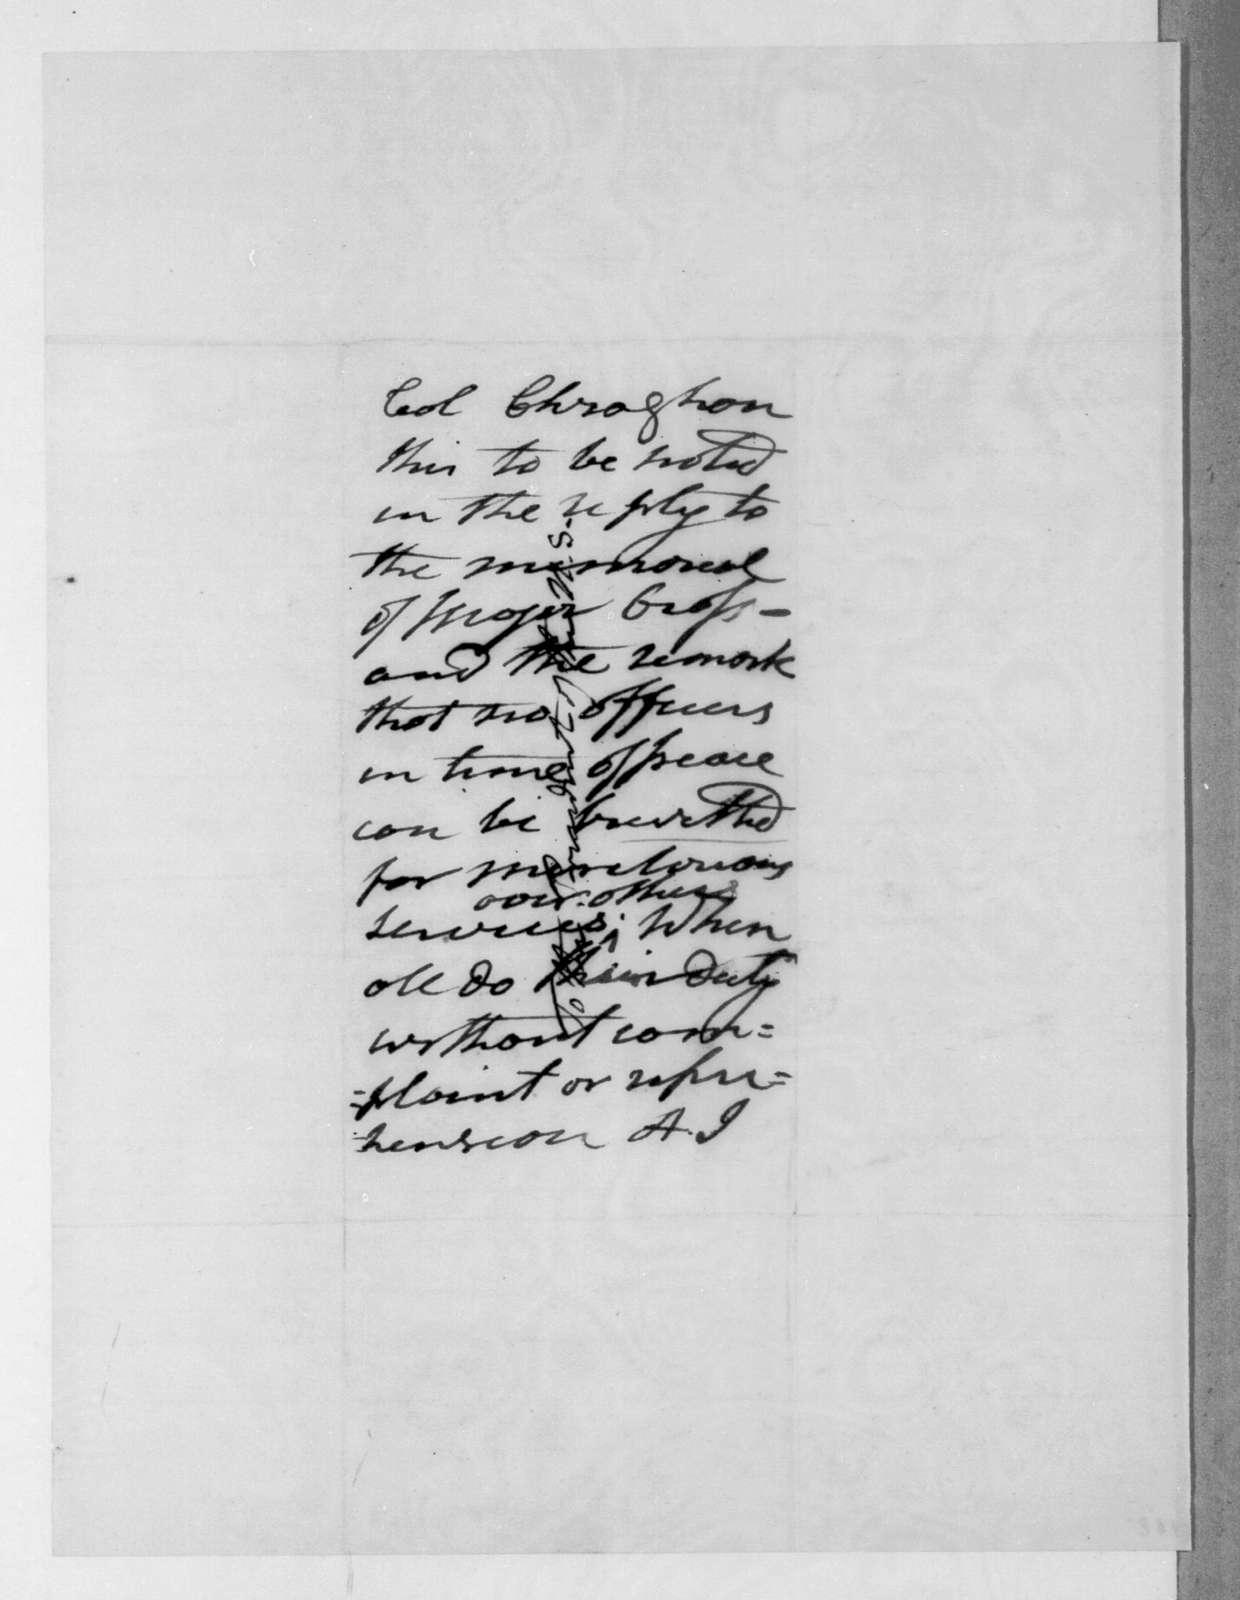 George Croghan to Andrew Jackson, December 22, 1834